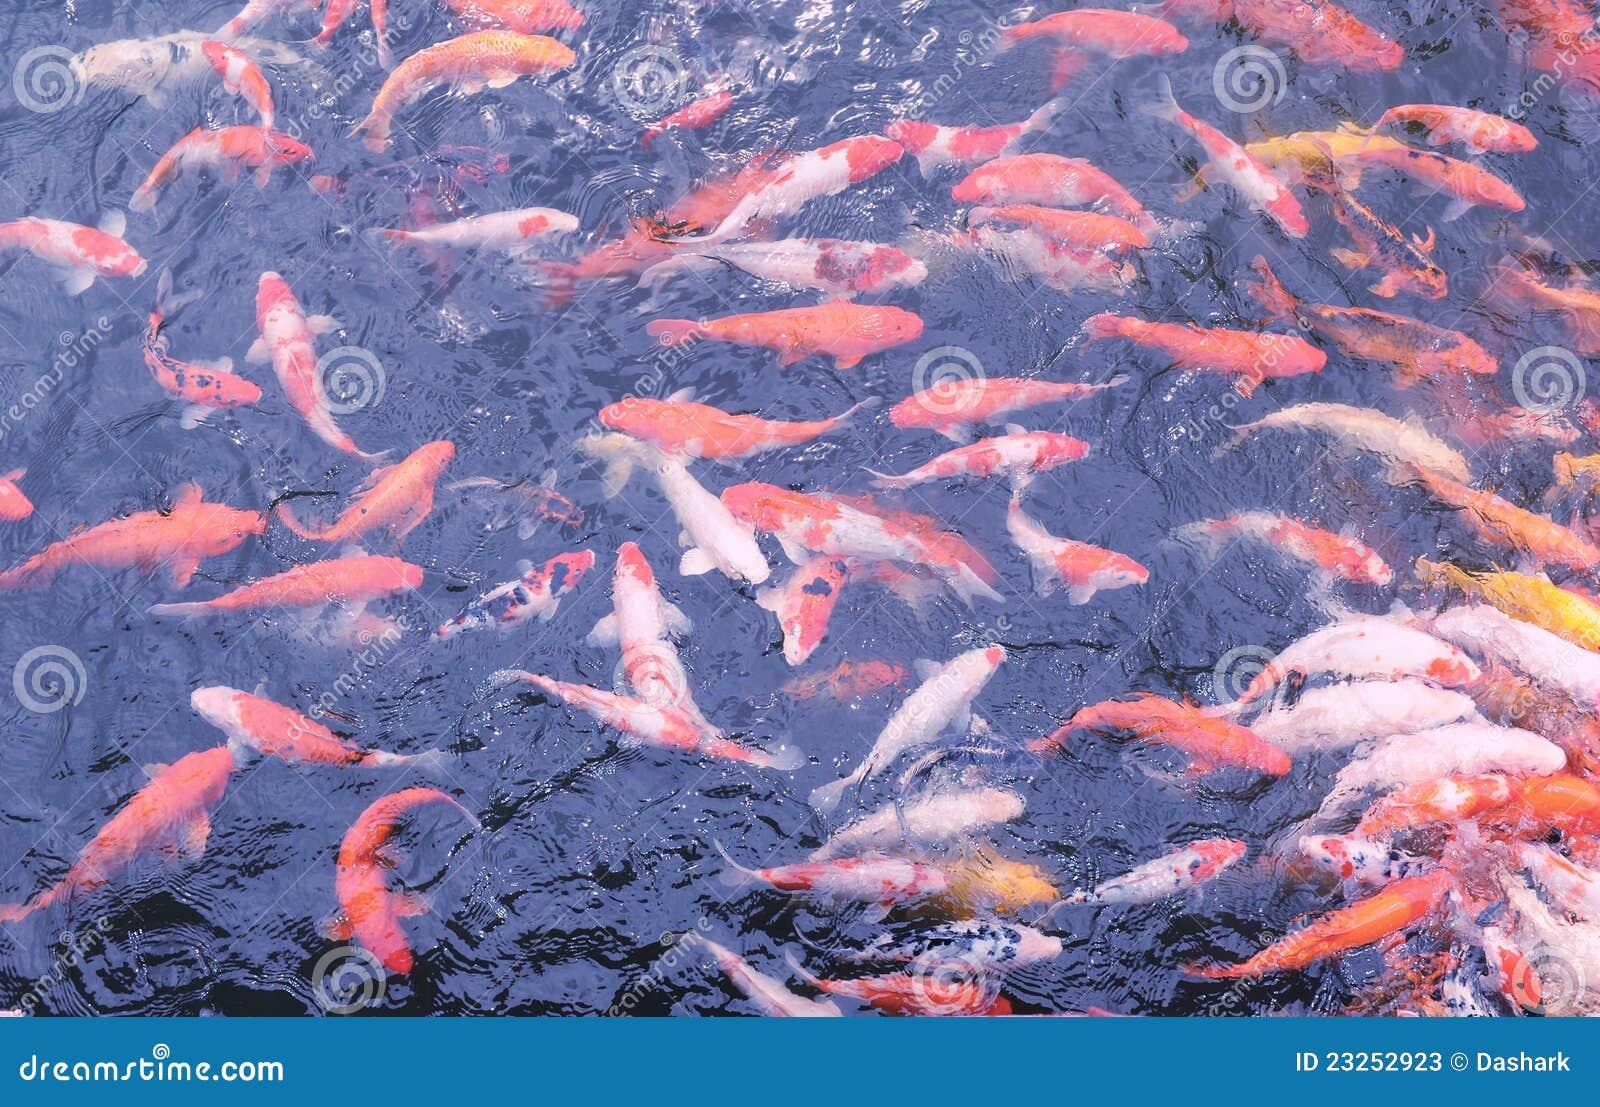 Pescados chinos fotos de archivo imagen 23252923 for Pescado chino